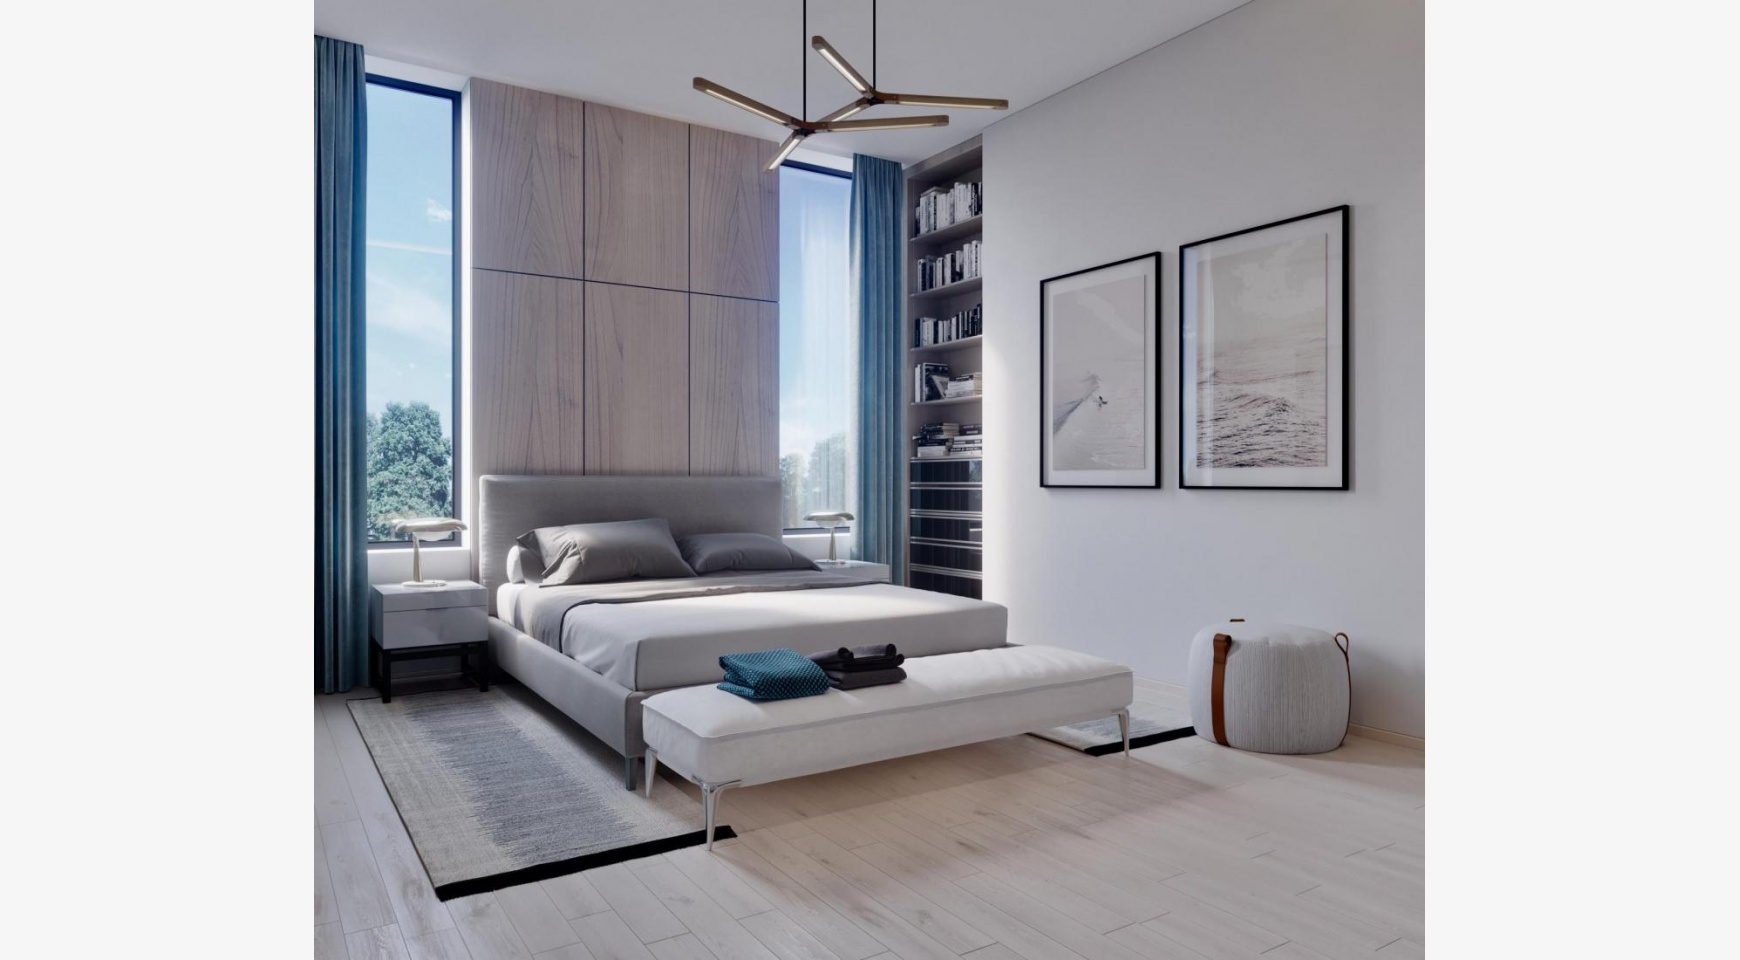 Contemporary 3 Bedroom Apartment in a New Complex near the Sea - 5